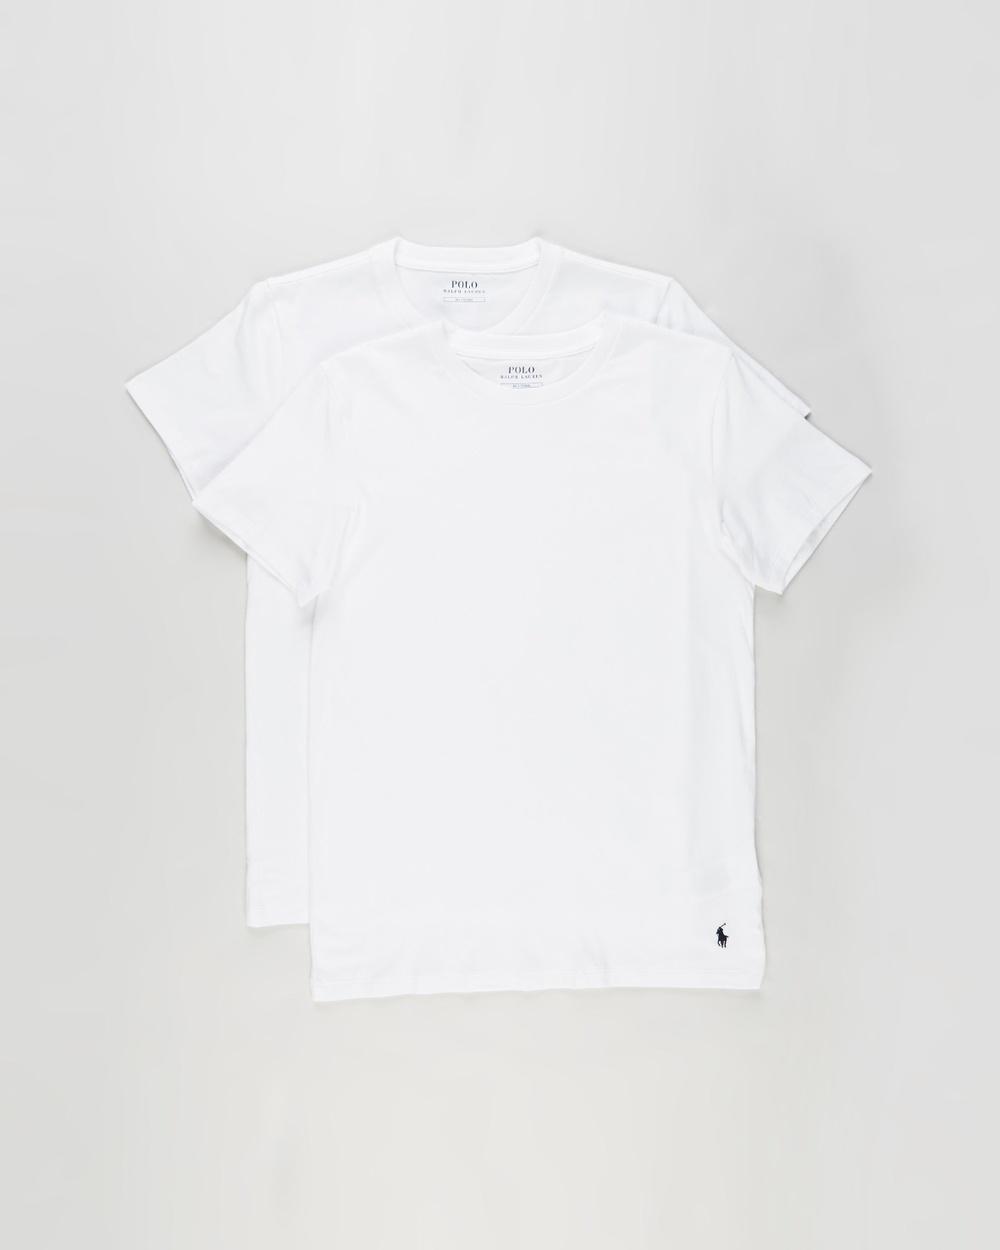 Polo Ralph Lauren - 2 Pack Short Sleeve Crew Tees - T-Shirts & Singlets (White) 2-Pack Short Sleeve Crew Tees